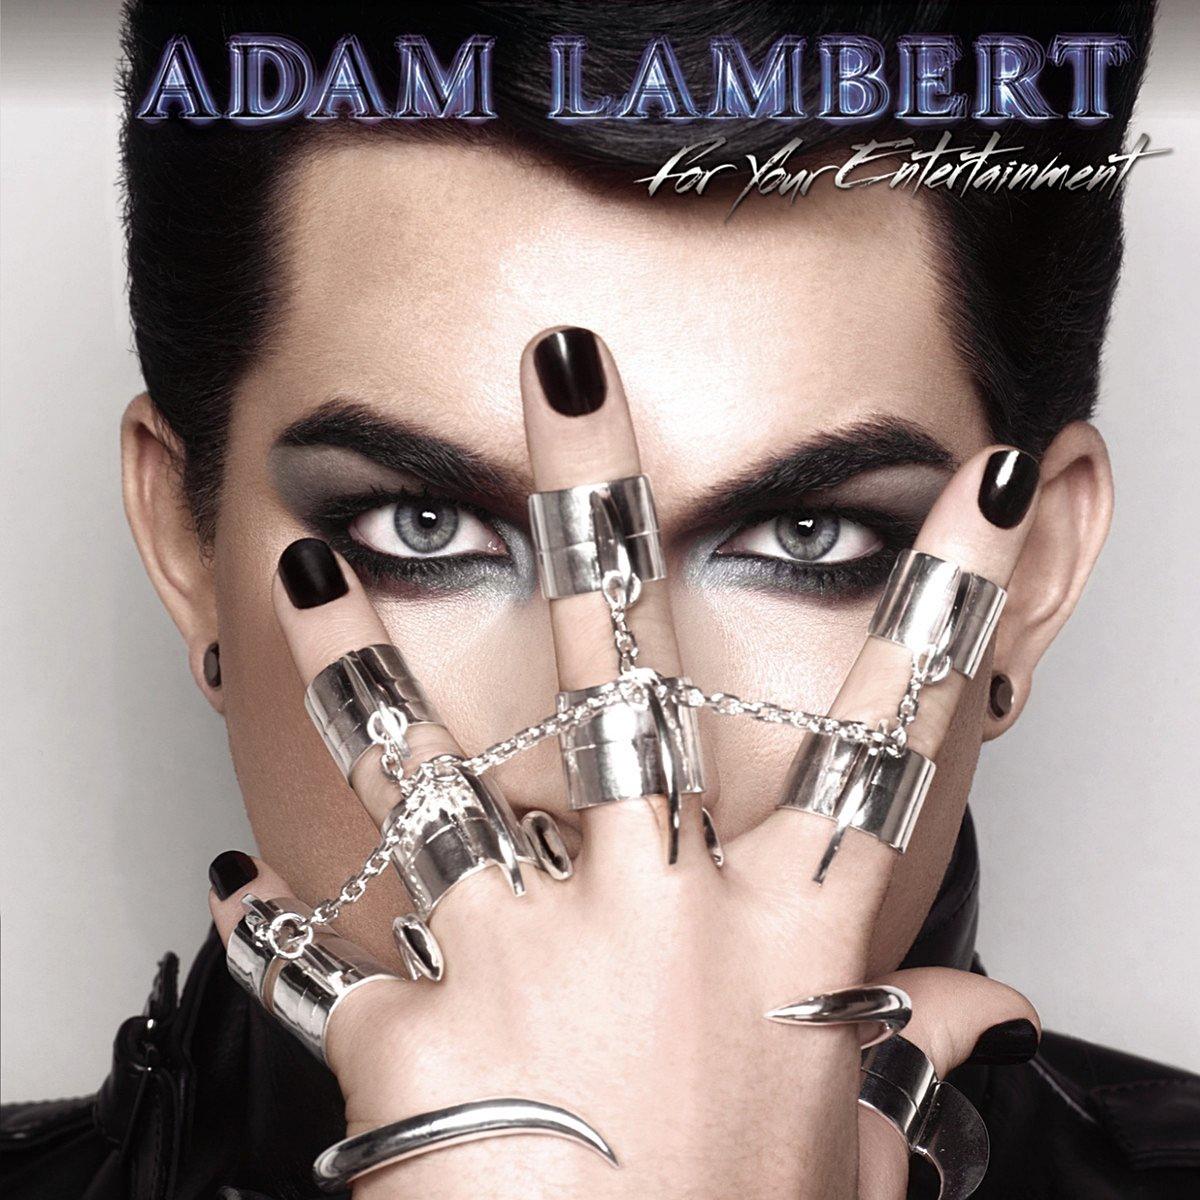 Adam Lambert album For Your Entertainment (Deluxe Version)